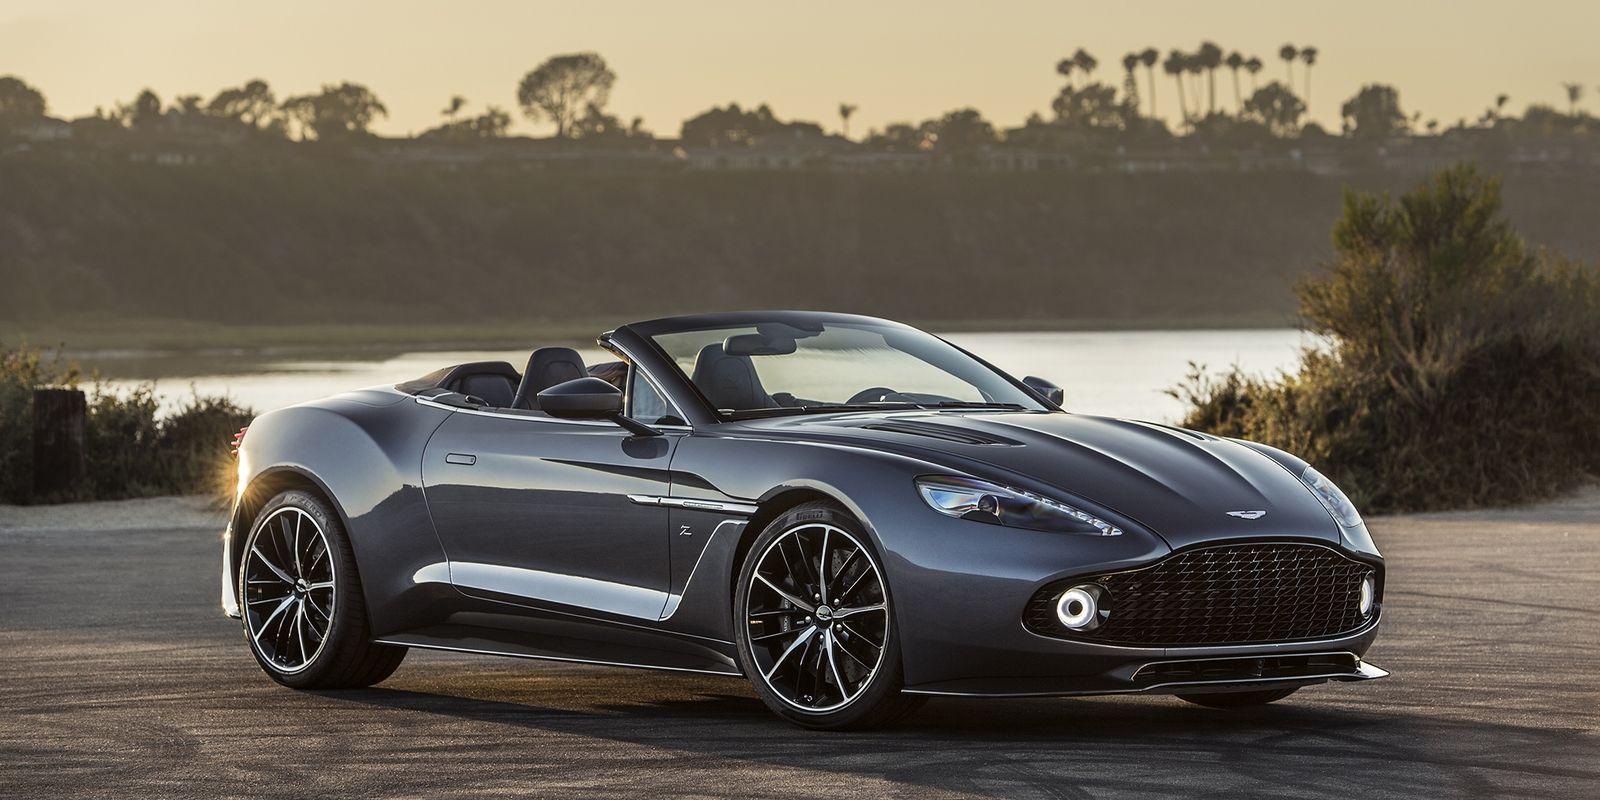 Aston Martin Will Build A Vanquish Zagato Speedster And Shooting - Galpin aston martin inventory